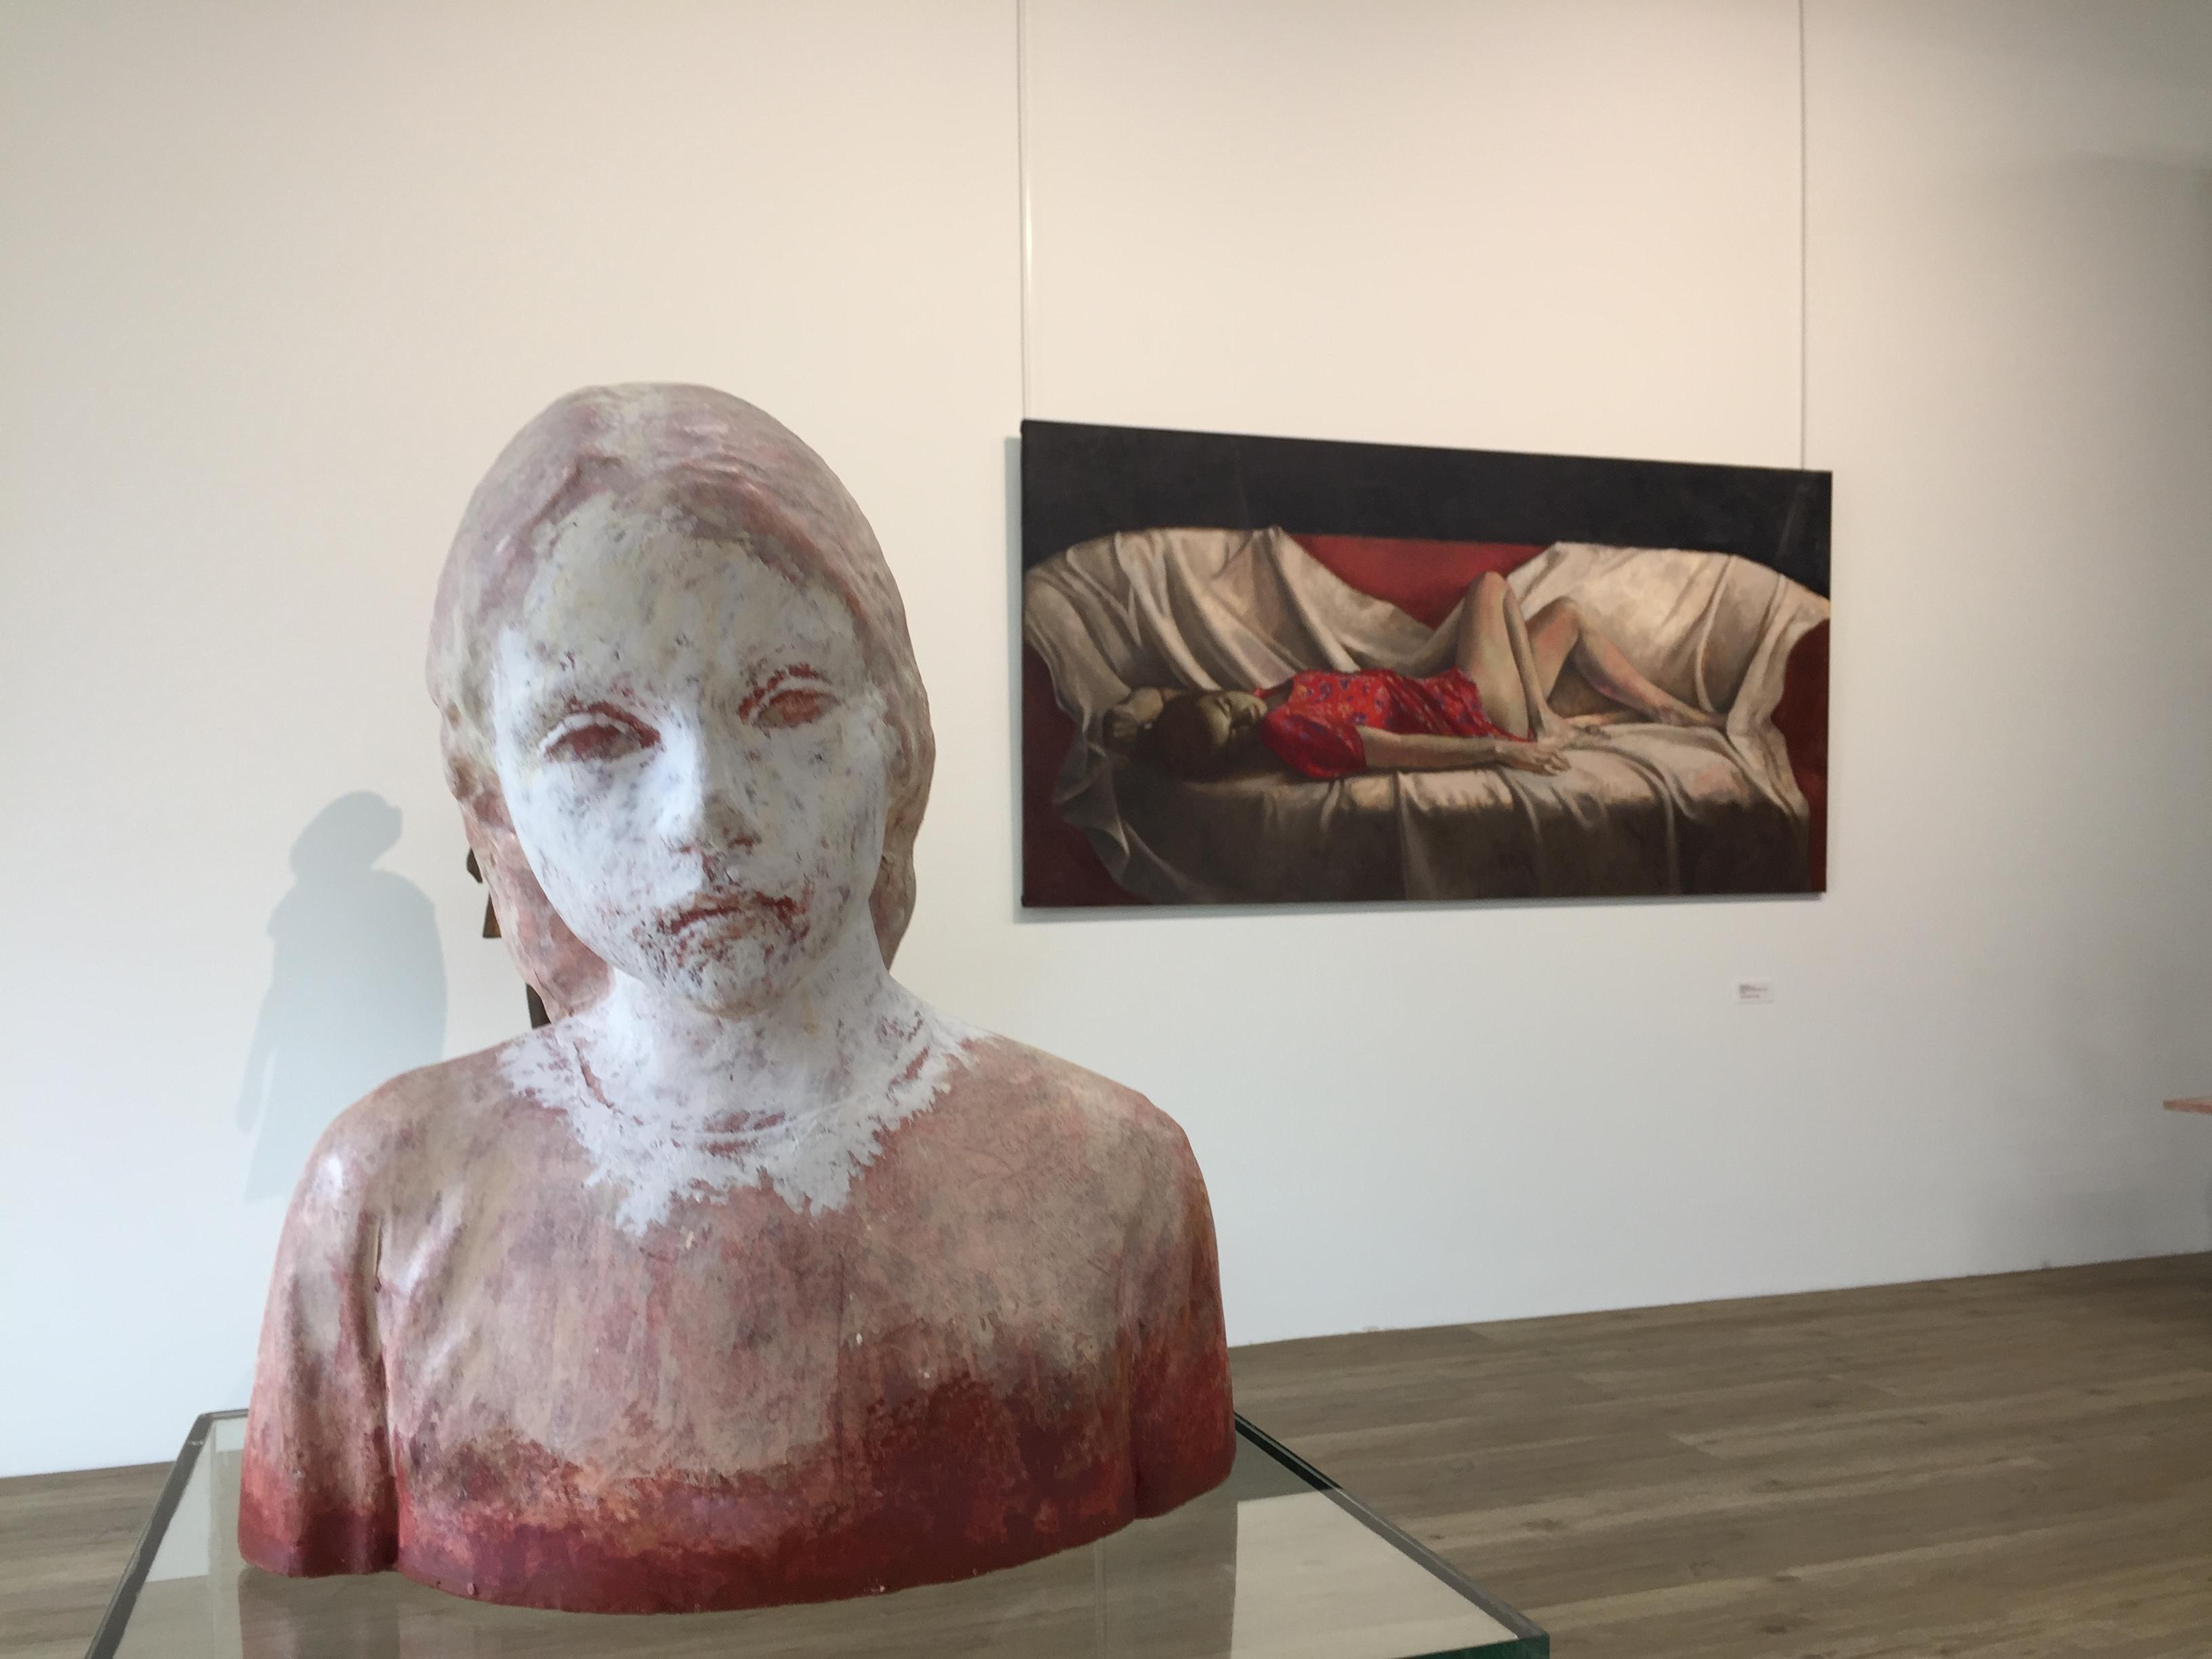 Girl, Head- 21st Century Contemporary Ceramic Sculpture of a Girl Head